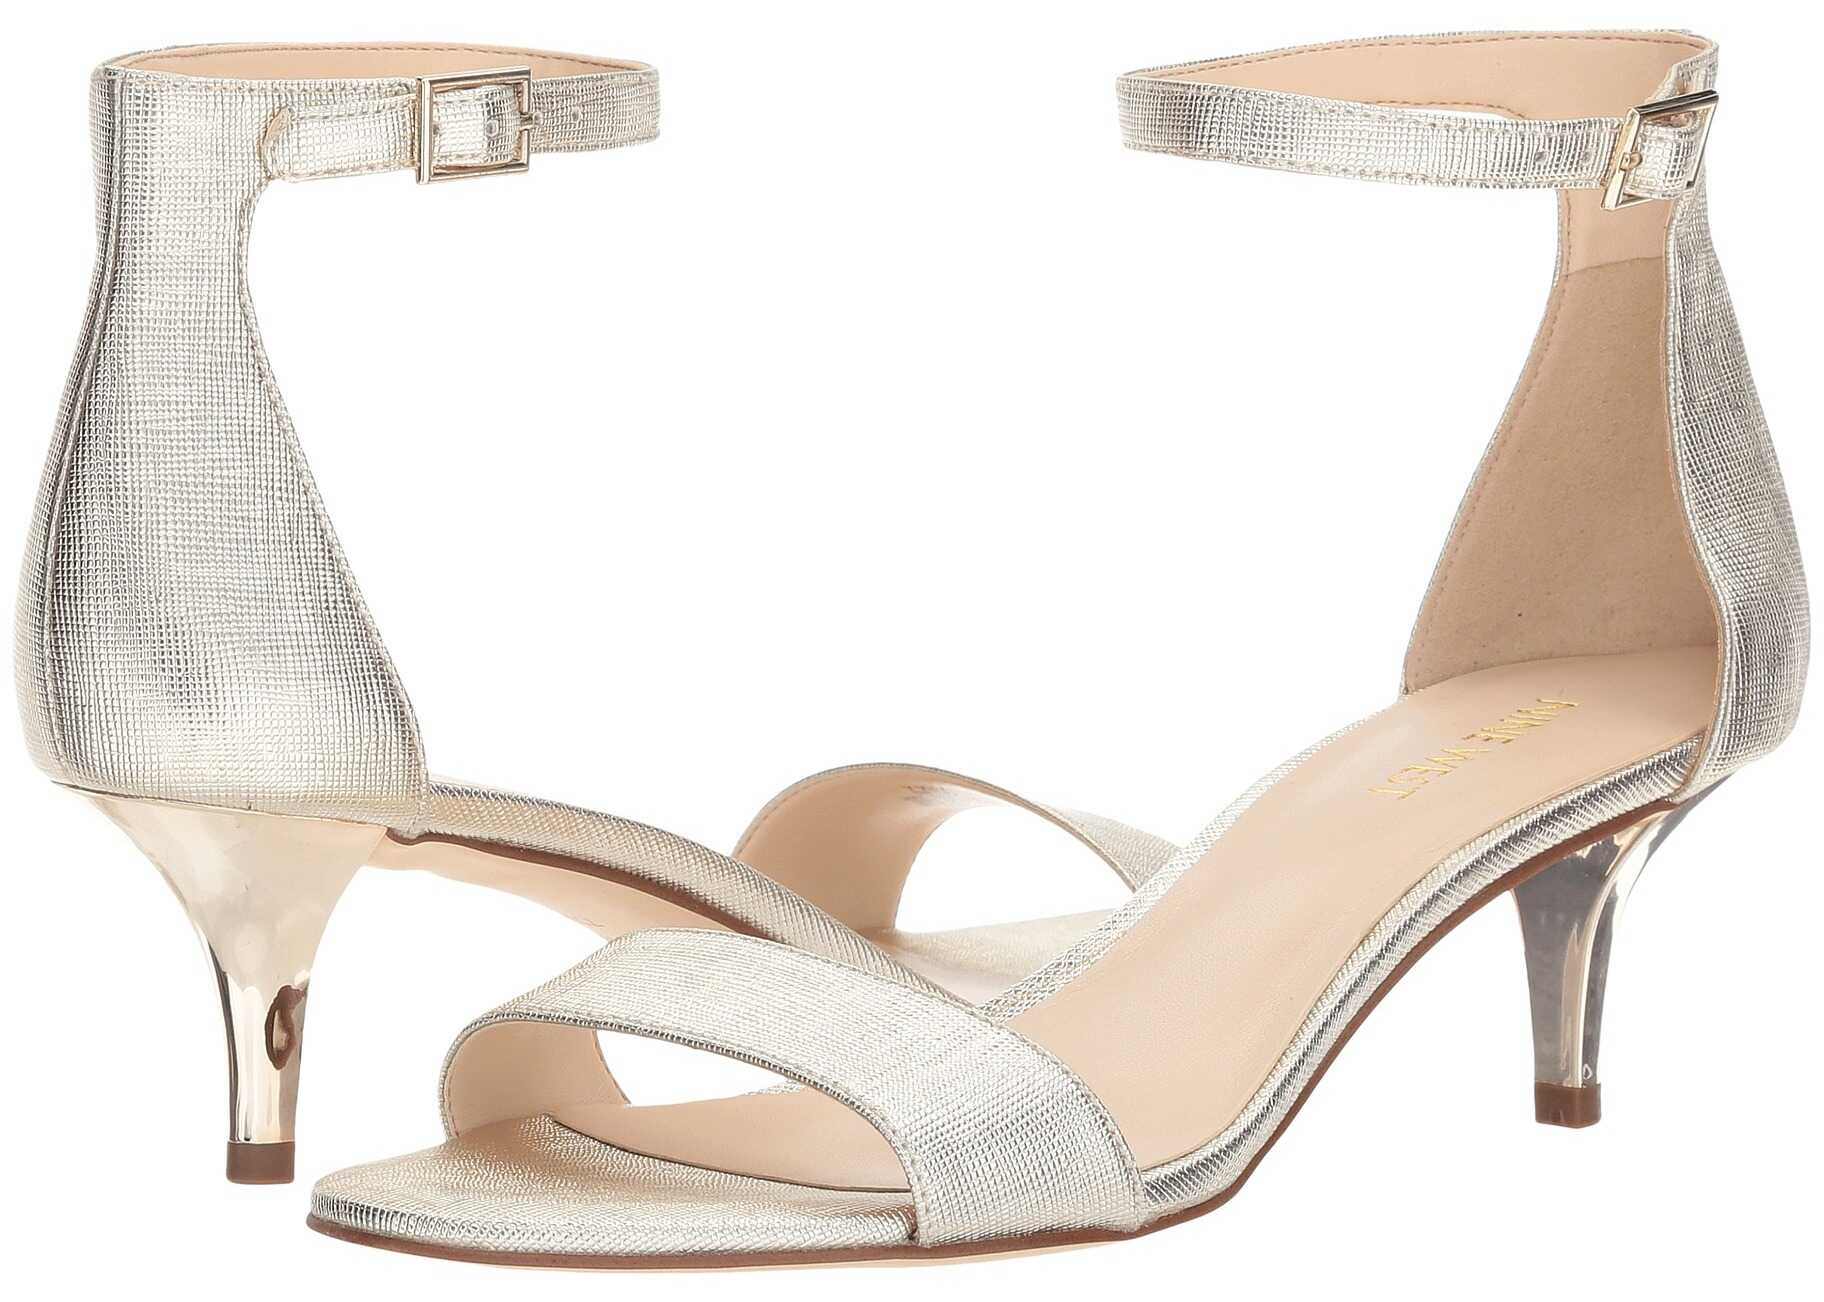 Nine West Leisa Heel Sandal Platino Etched Metallic PU